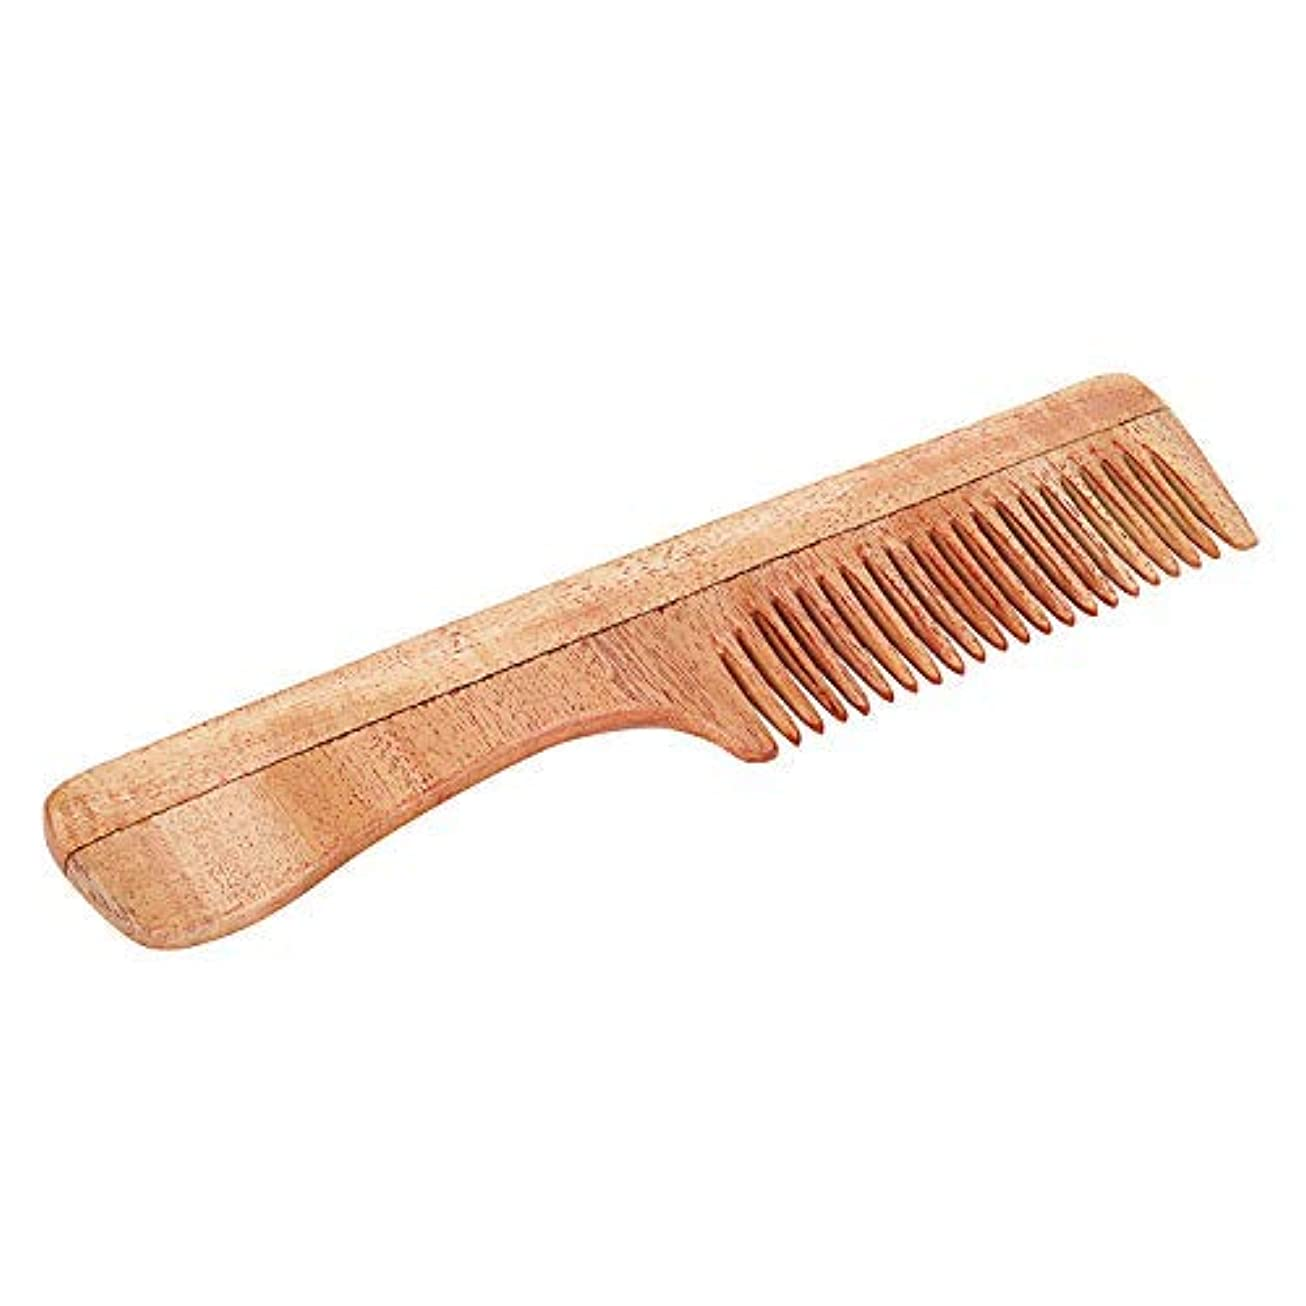 SVATV Handcrafted Neem Wood Comb with Handle N-73 (7